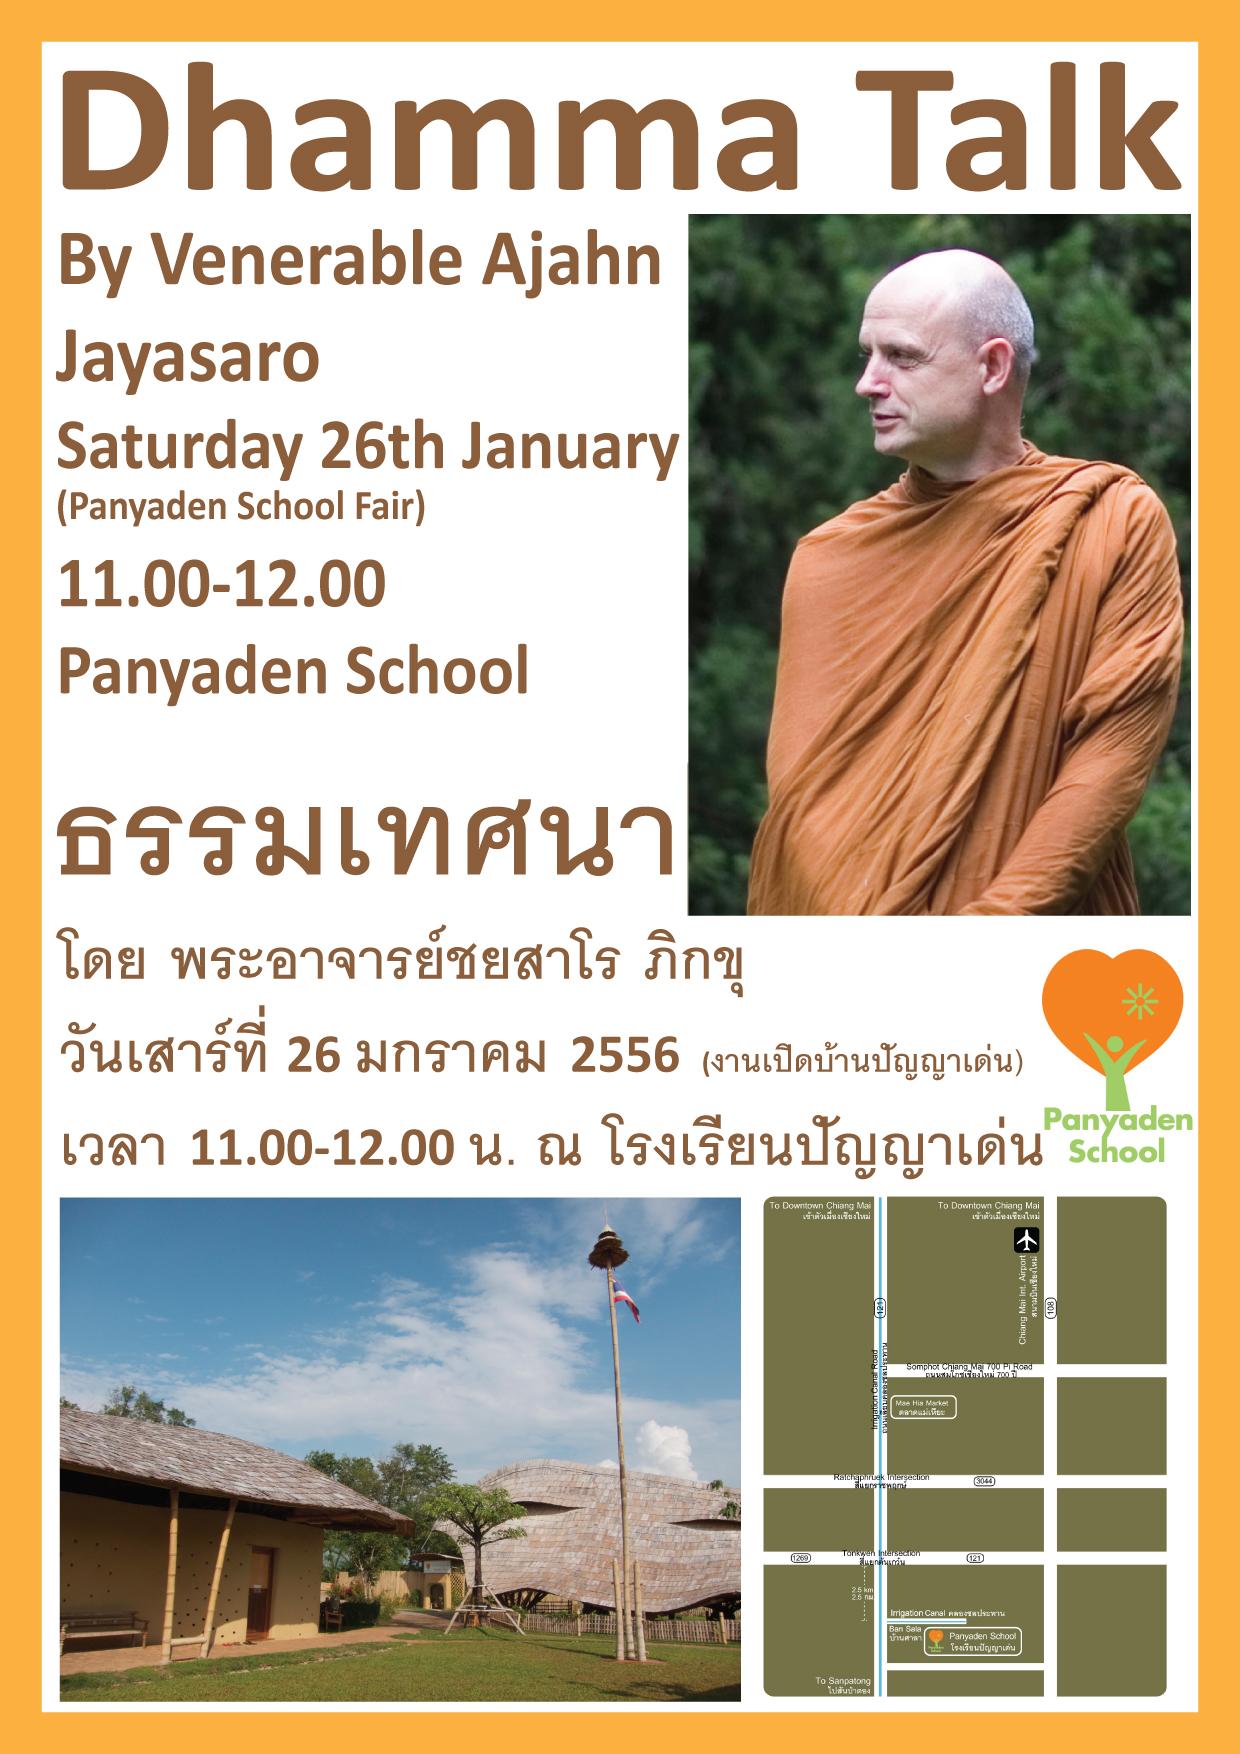 Dhamma Talk at Panyaden School Chiang Mai, 26 Jan 2013